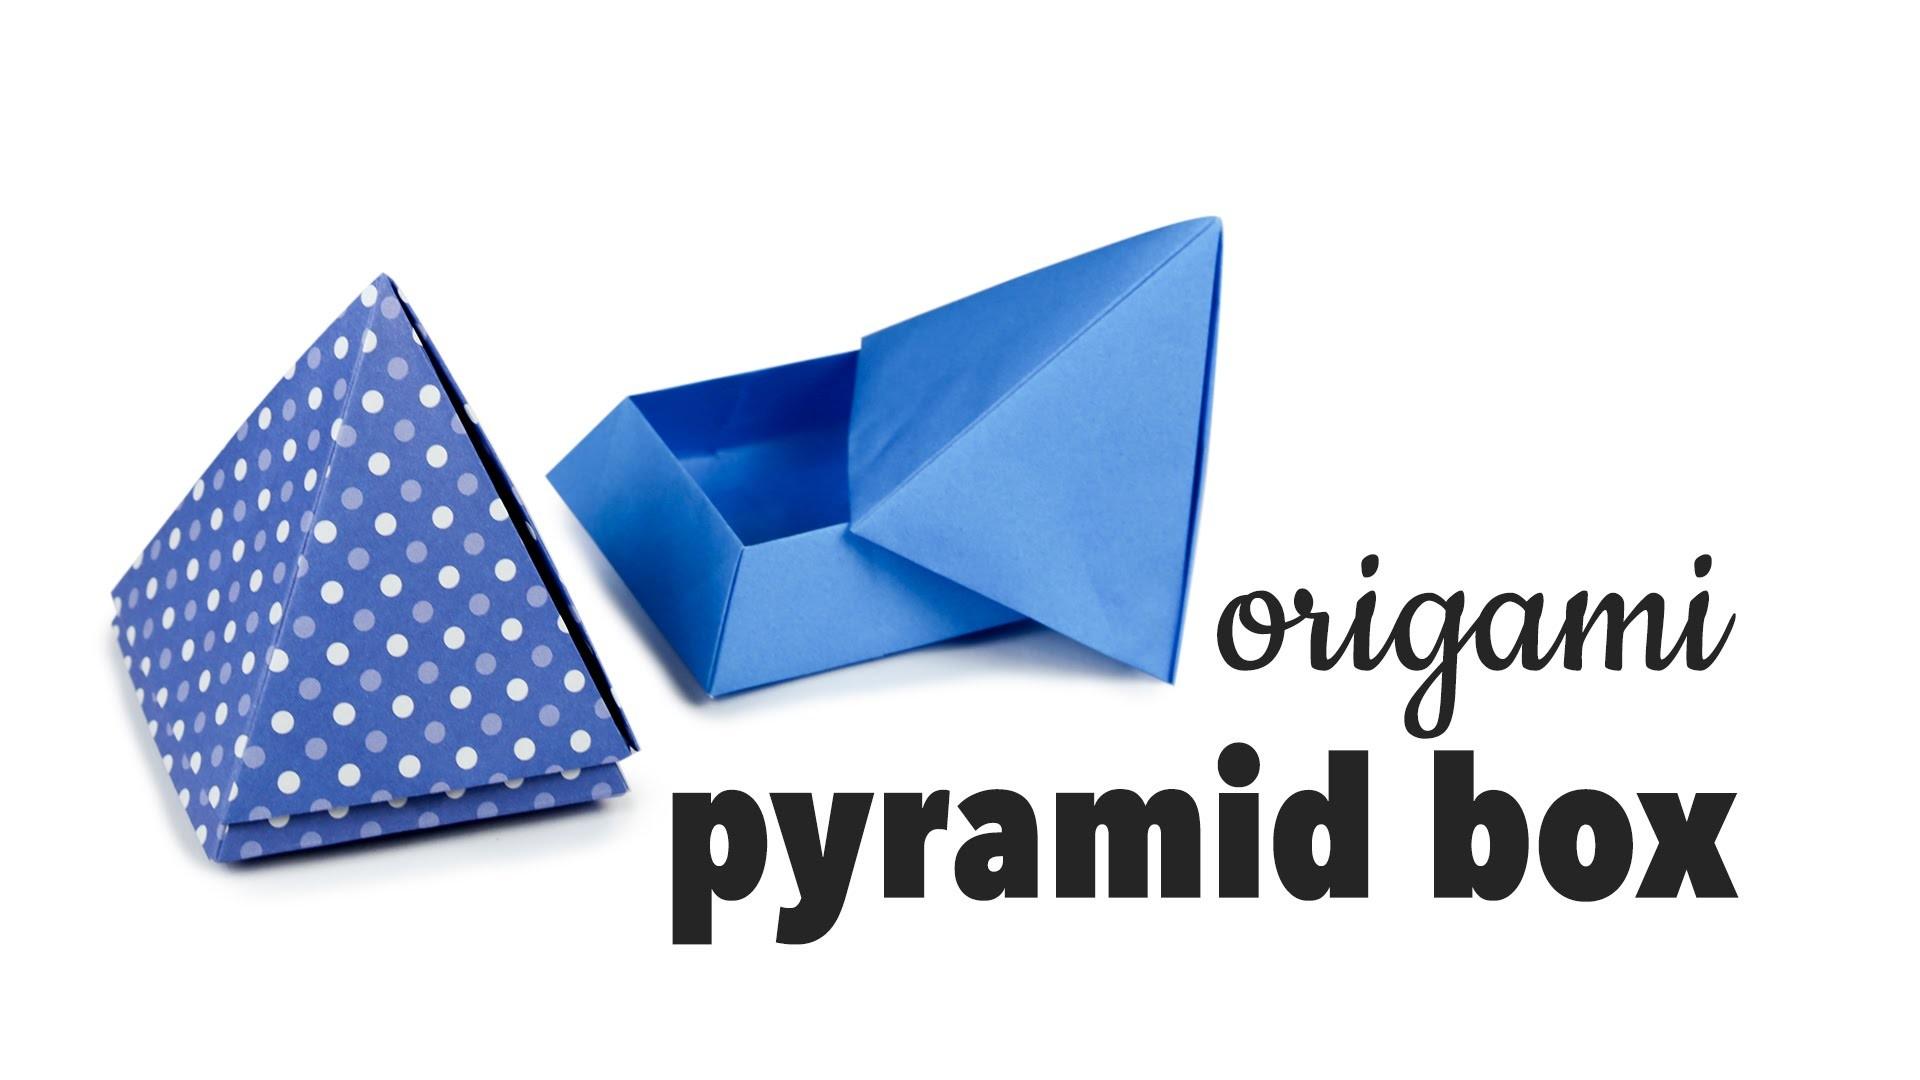 Origami Pyramid Box Tutorial ♥︎ DIY ♥︎ Cute Gift Box ♥︎